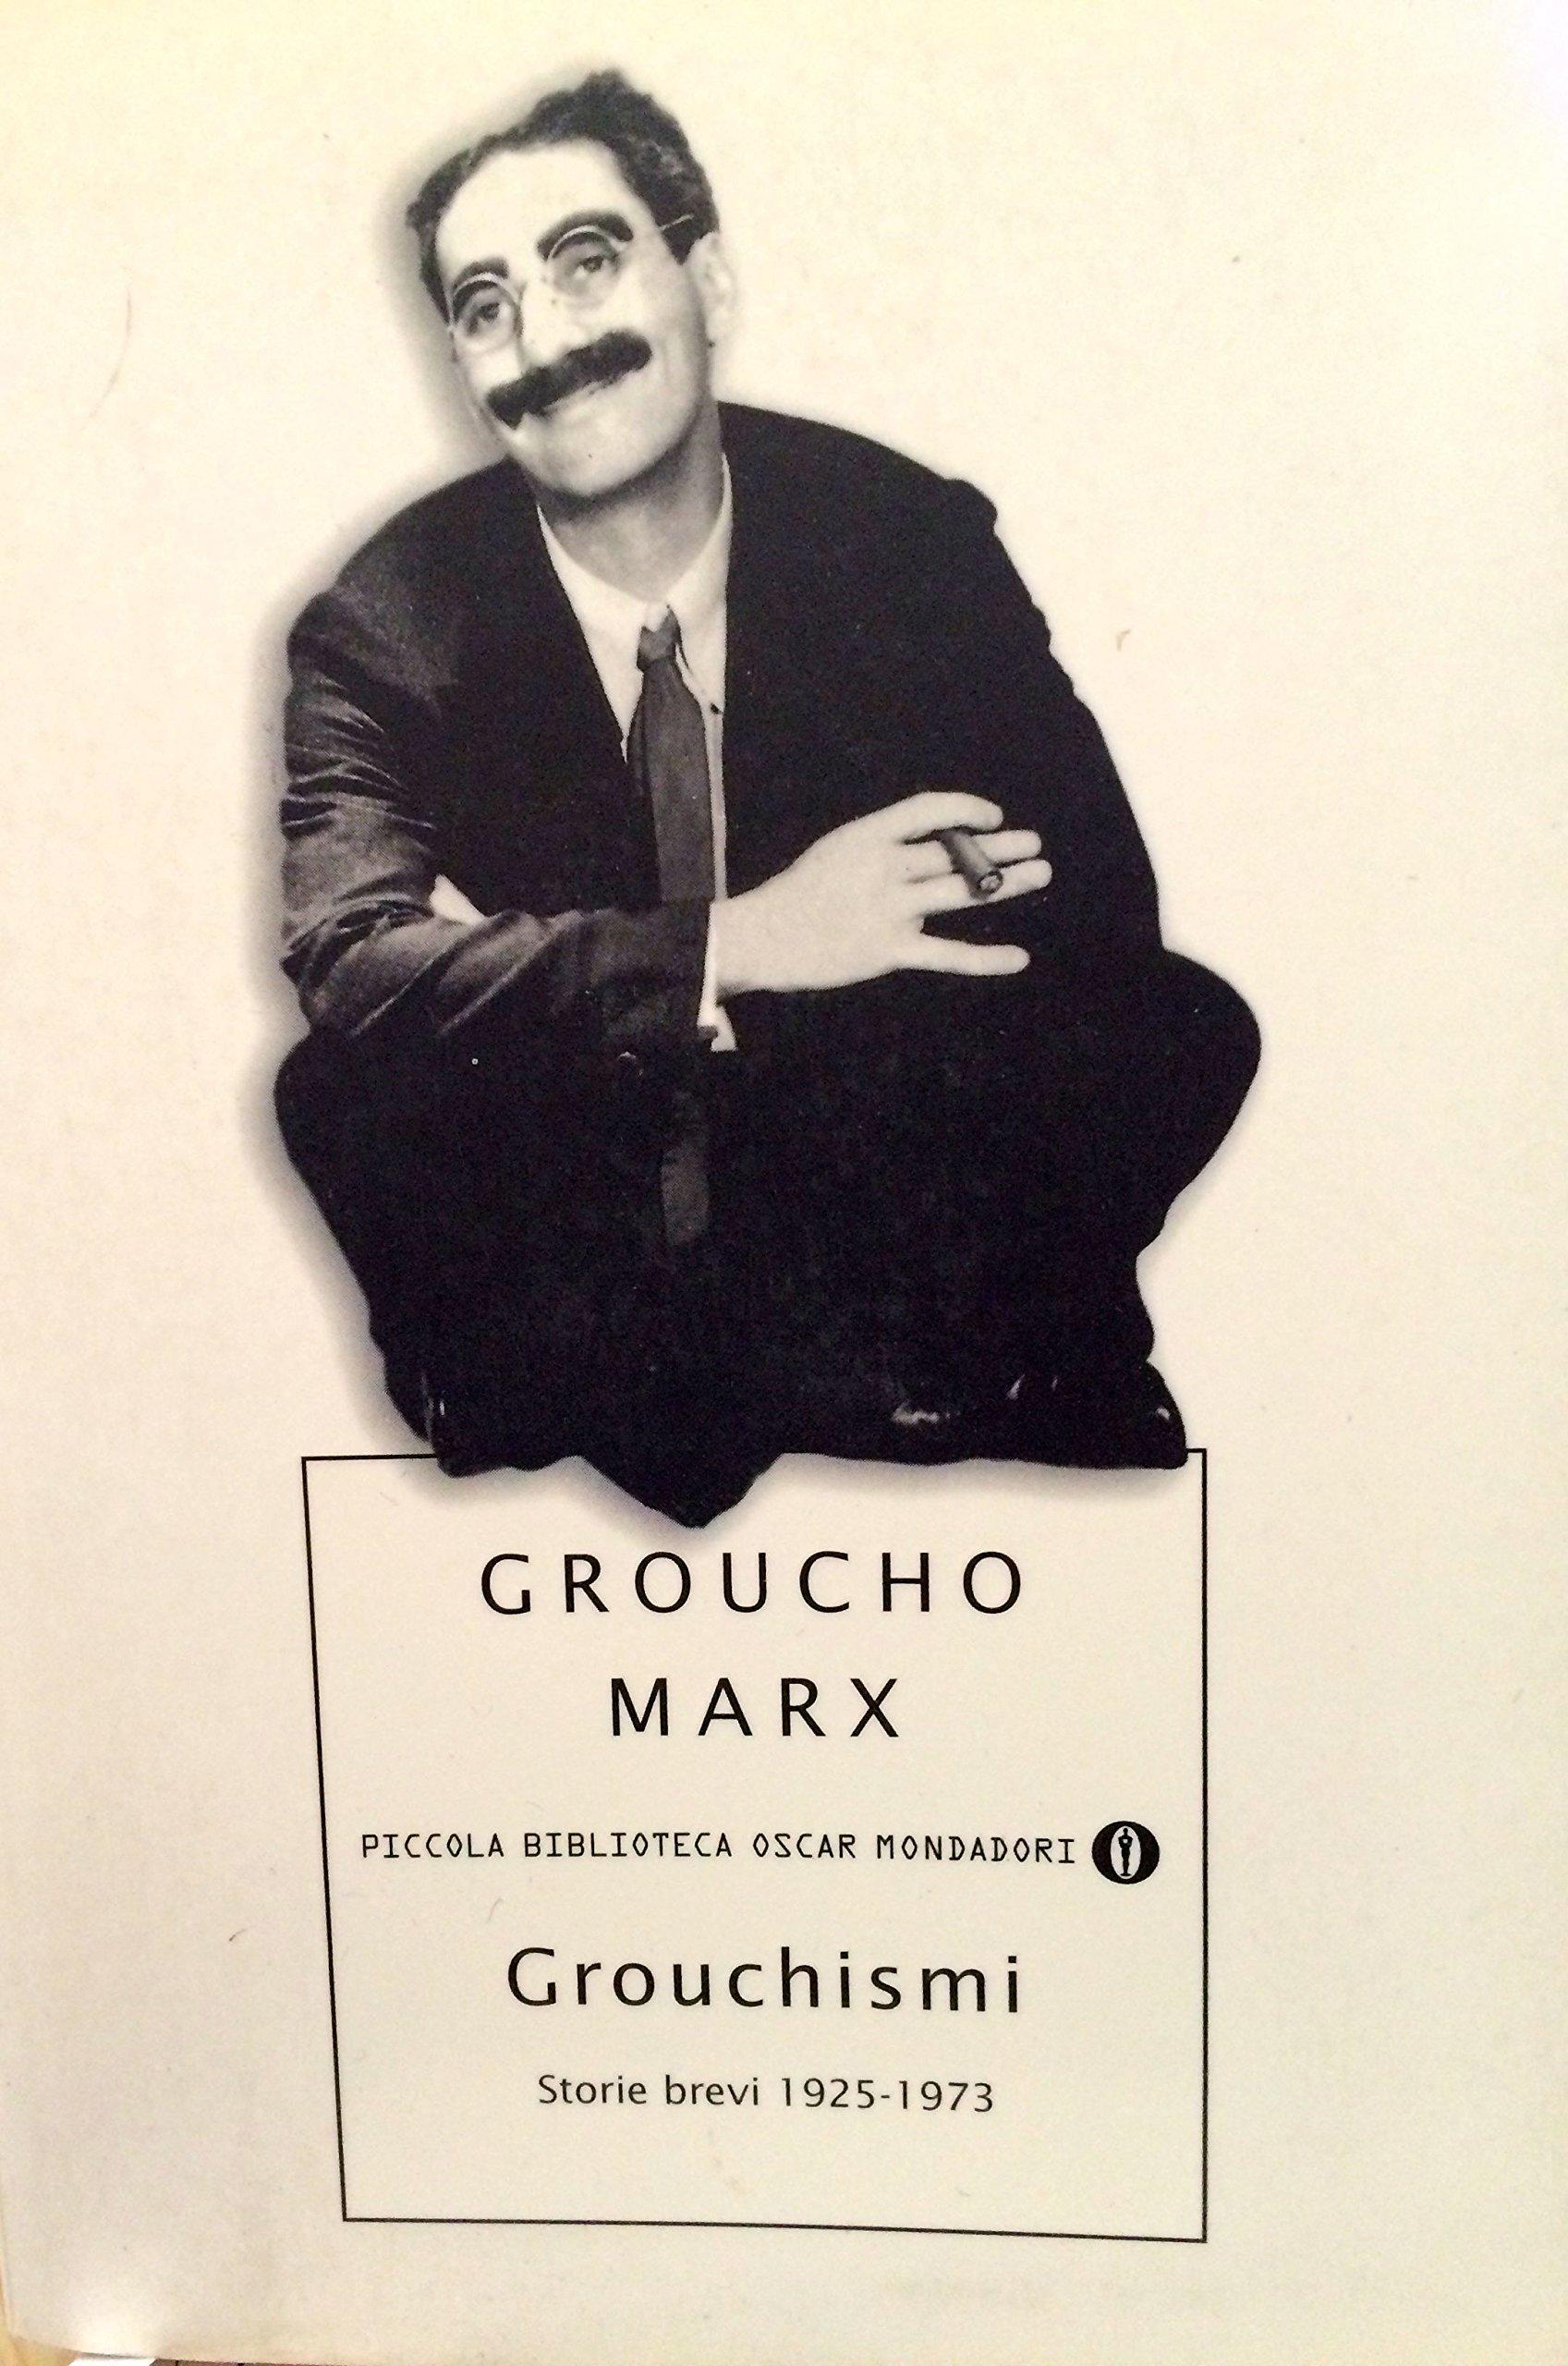 Grouchismi